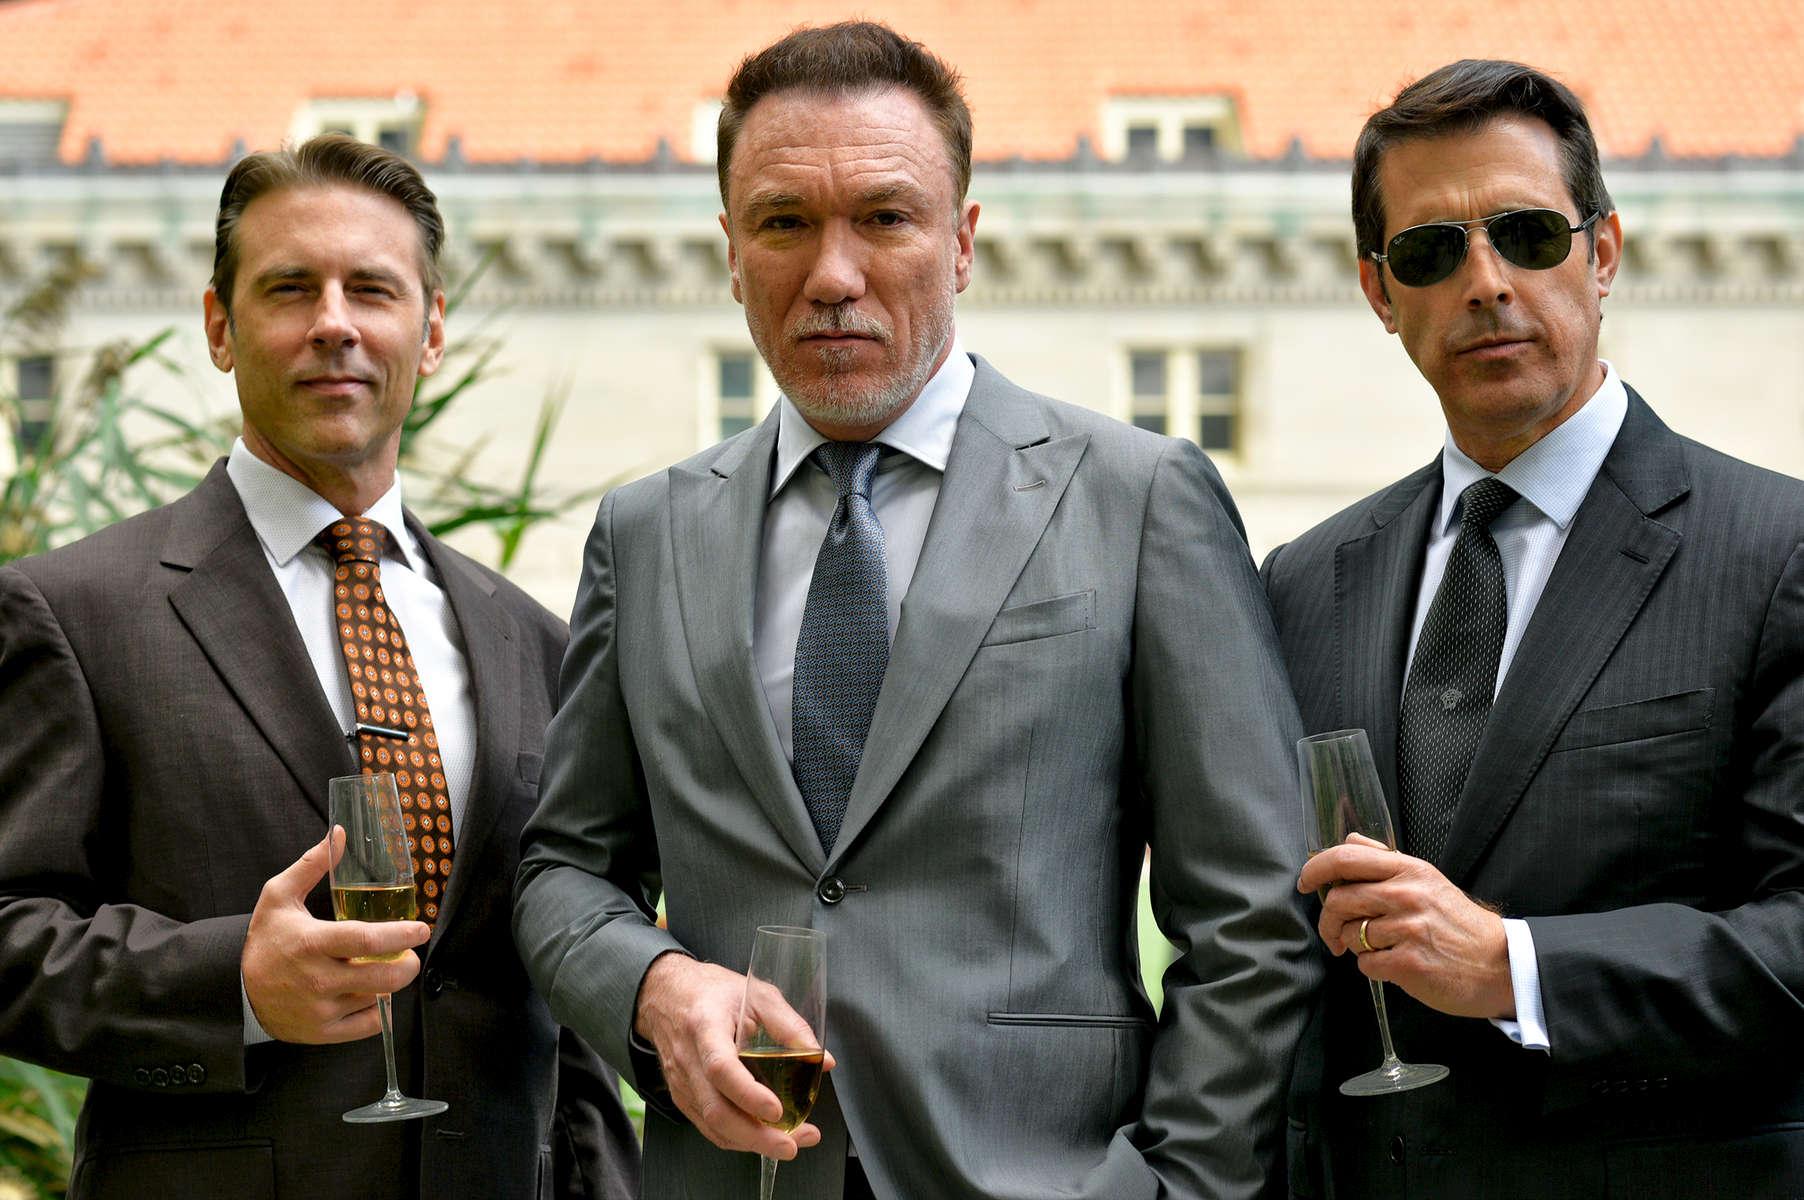 Actors for The Blacklist episode.